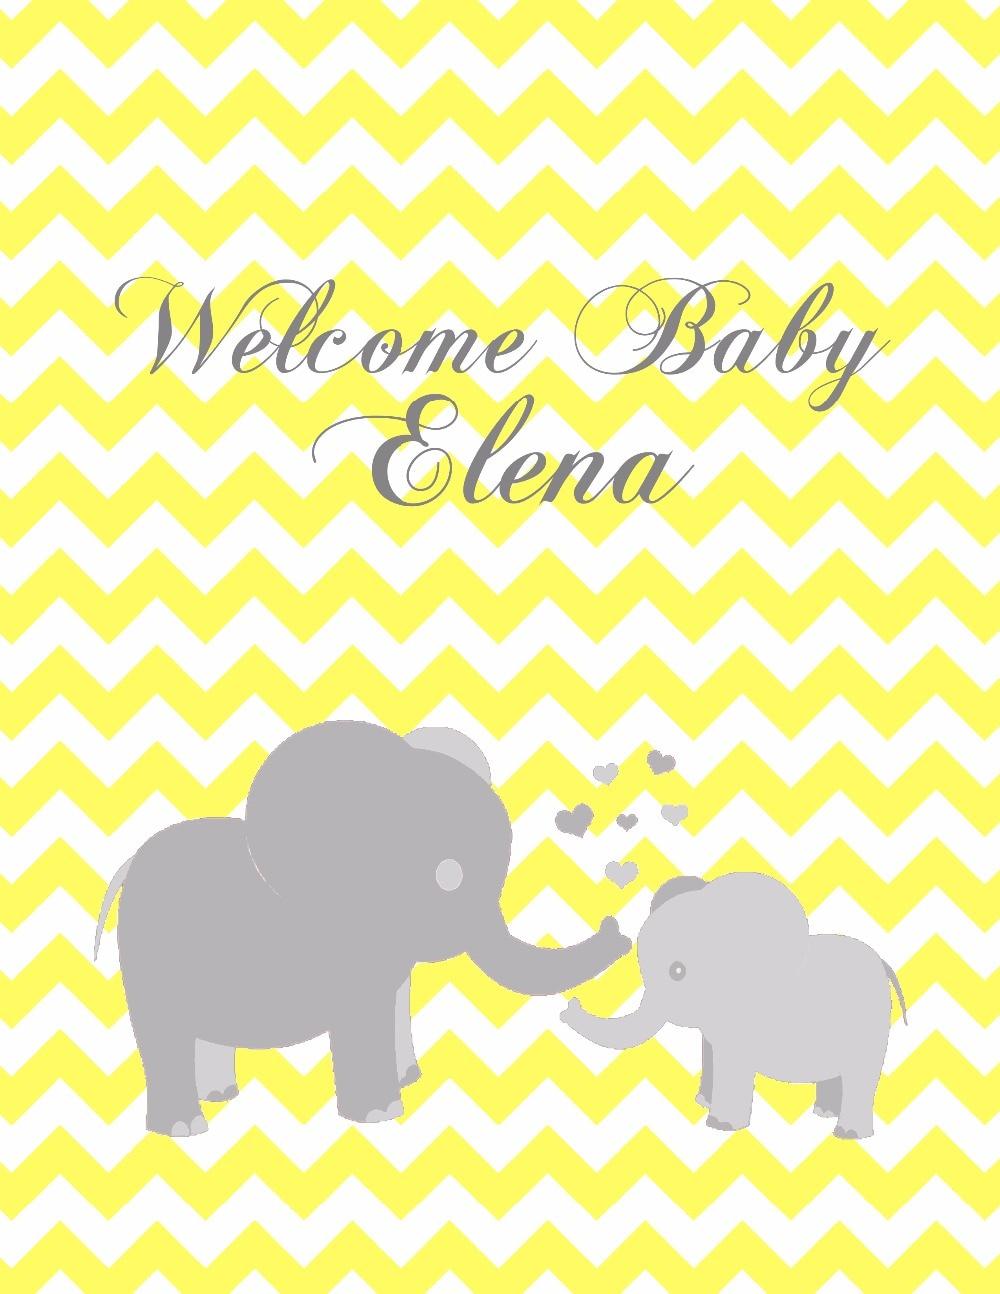 Lemon baby shower party photo background elephants photography backdrops for photo studio props photography background retro background christmas photo props photography screen backdrops for children vinyl 7x5ft or 5x3ft christmas033